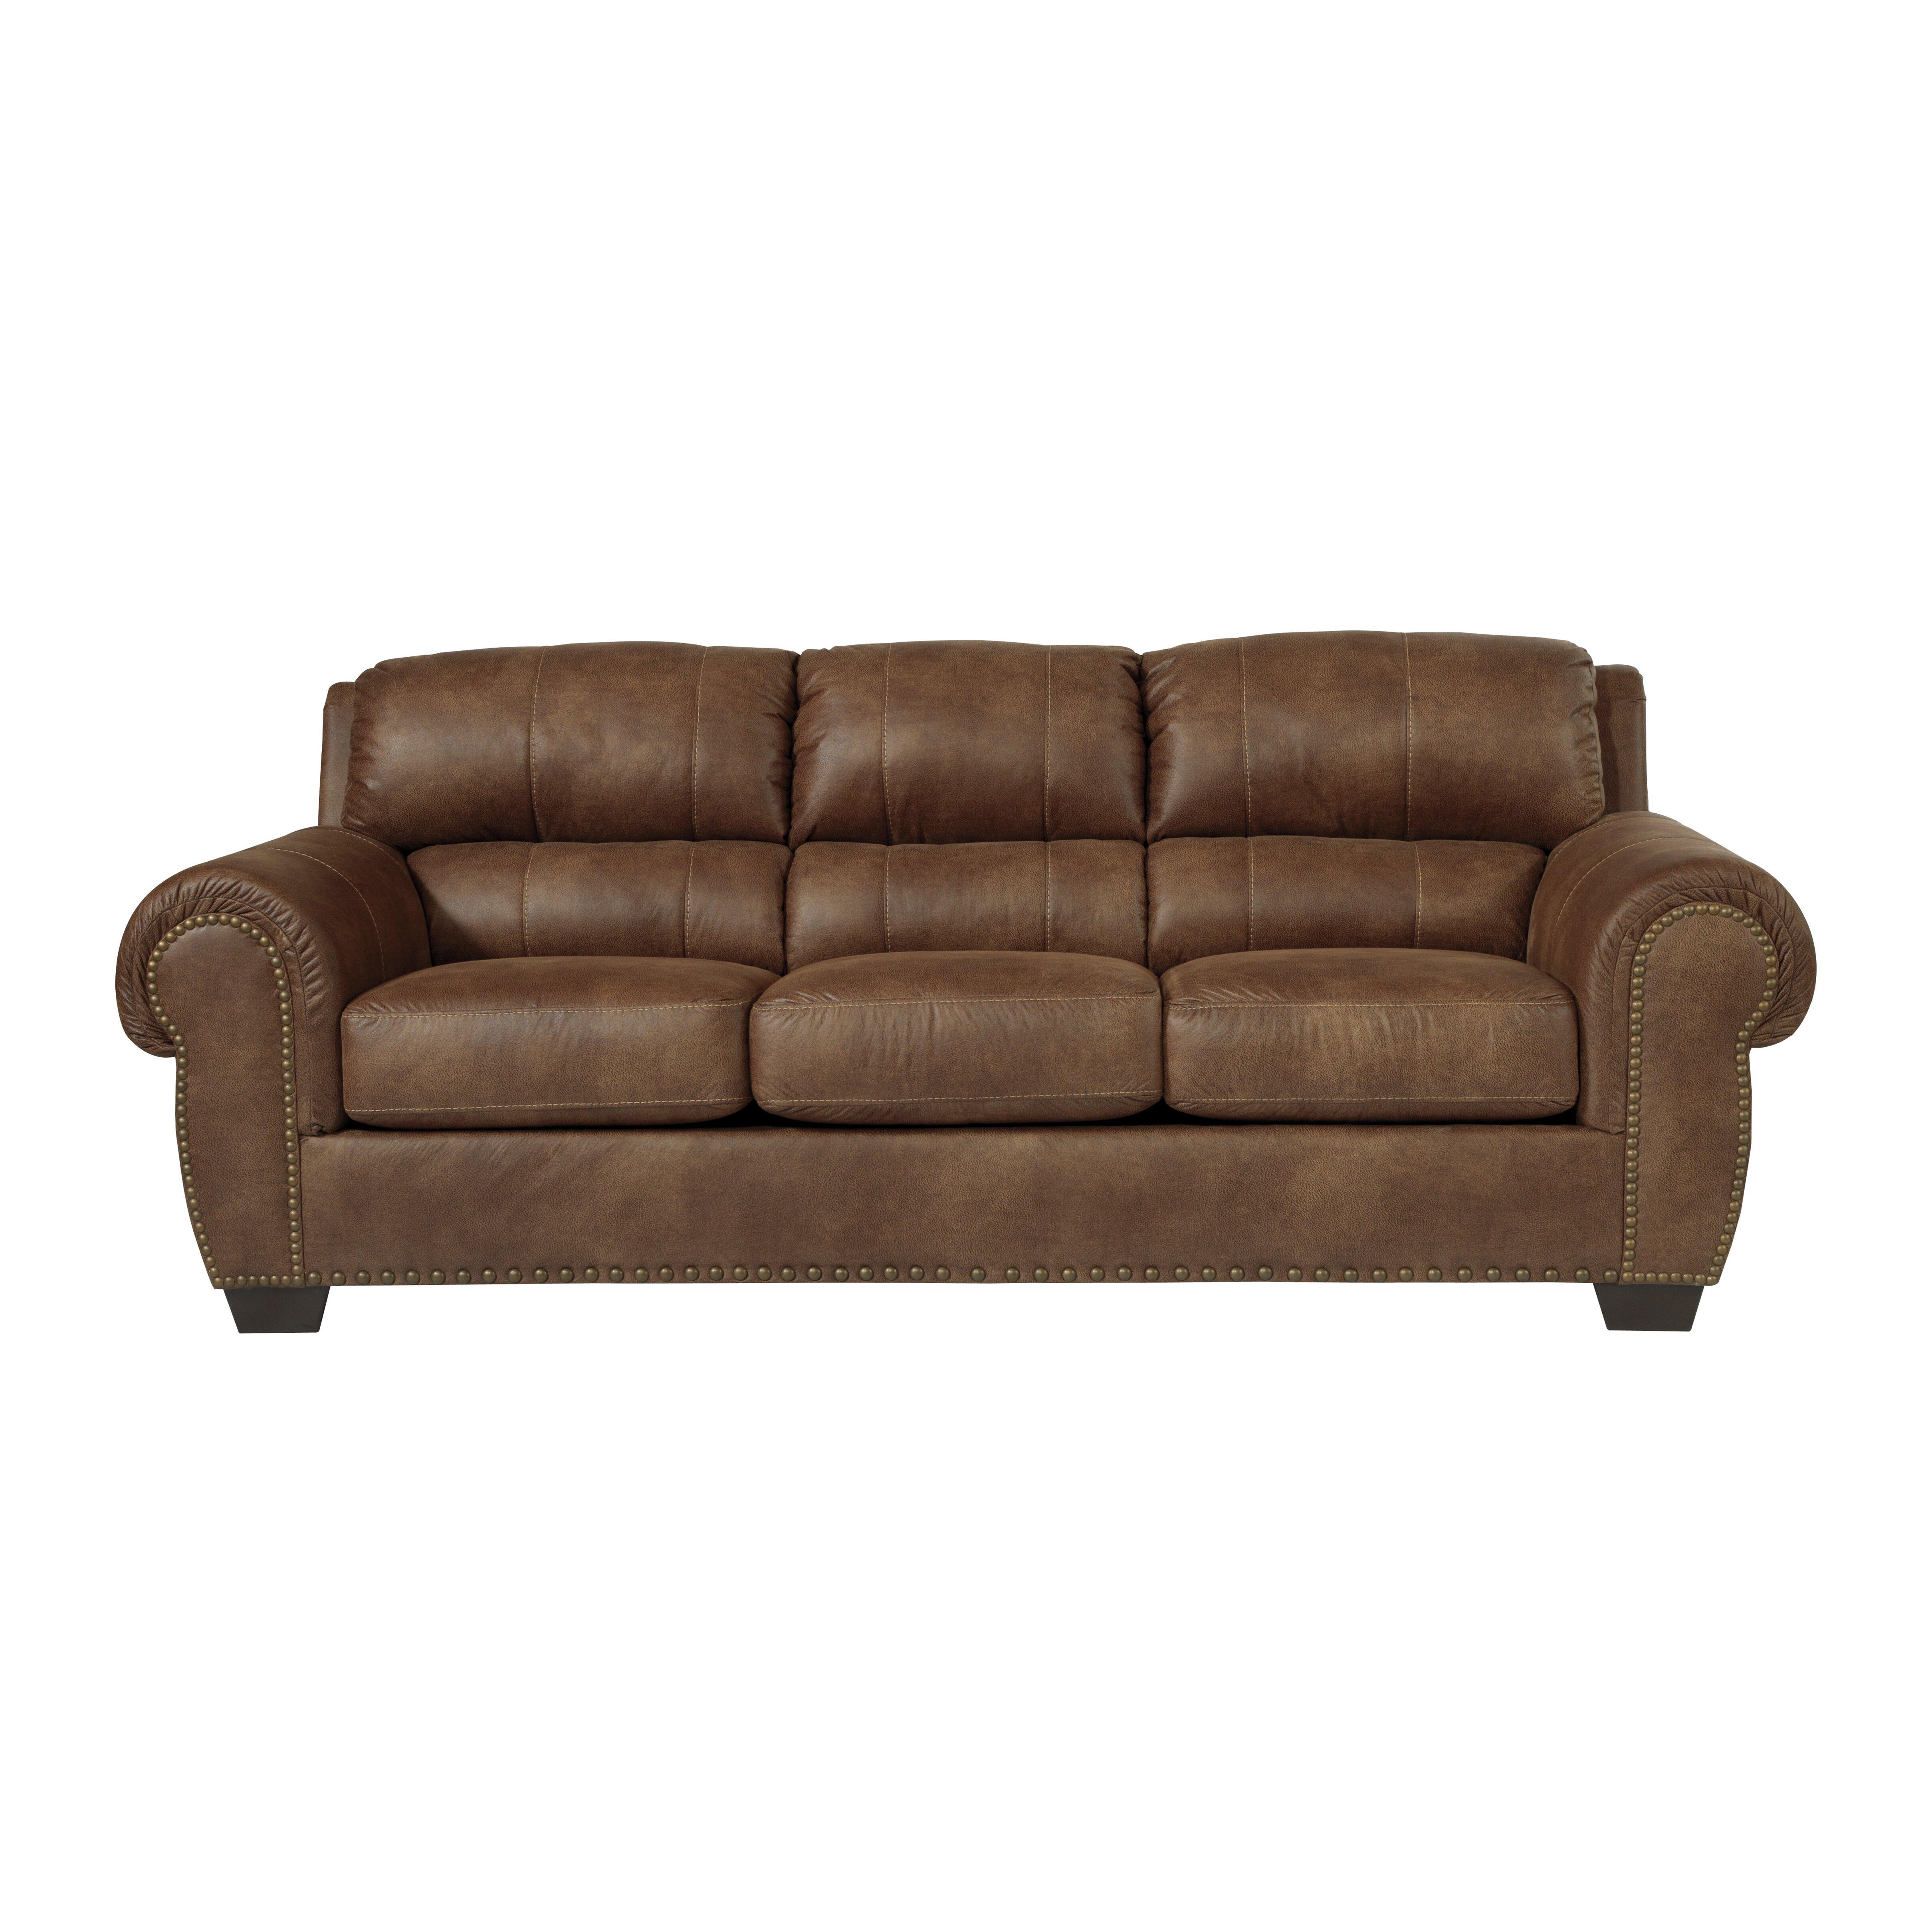 benchcraft sofas 28 images benchcraft pelsor  : Burnsville Sleeper Sofa 9720638 from 165.227.196.75 size 4839 x 4839 jpeg 2085kB